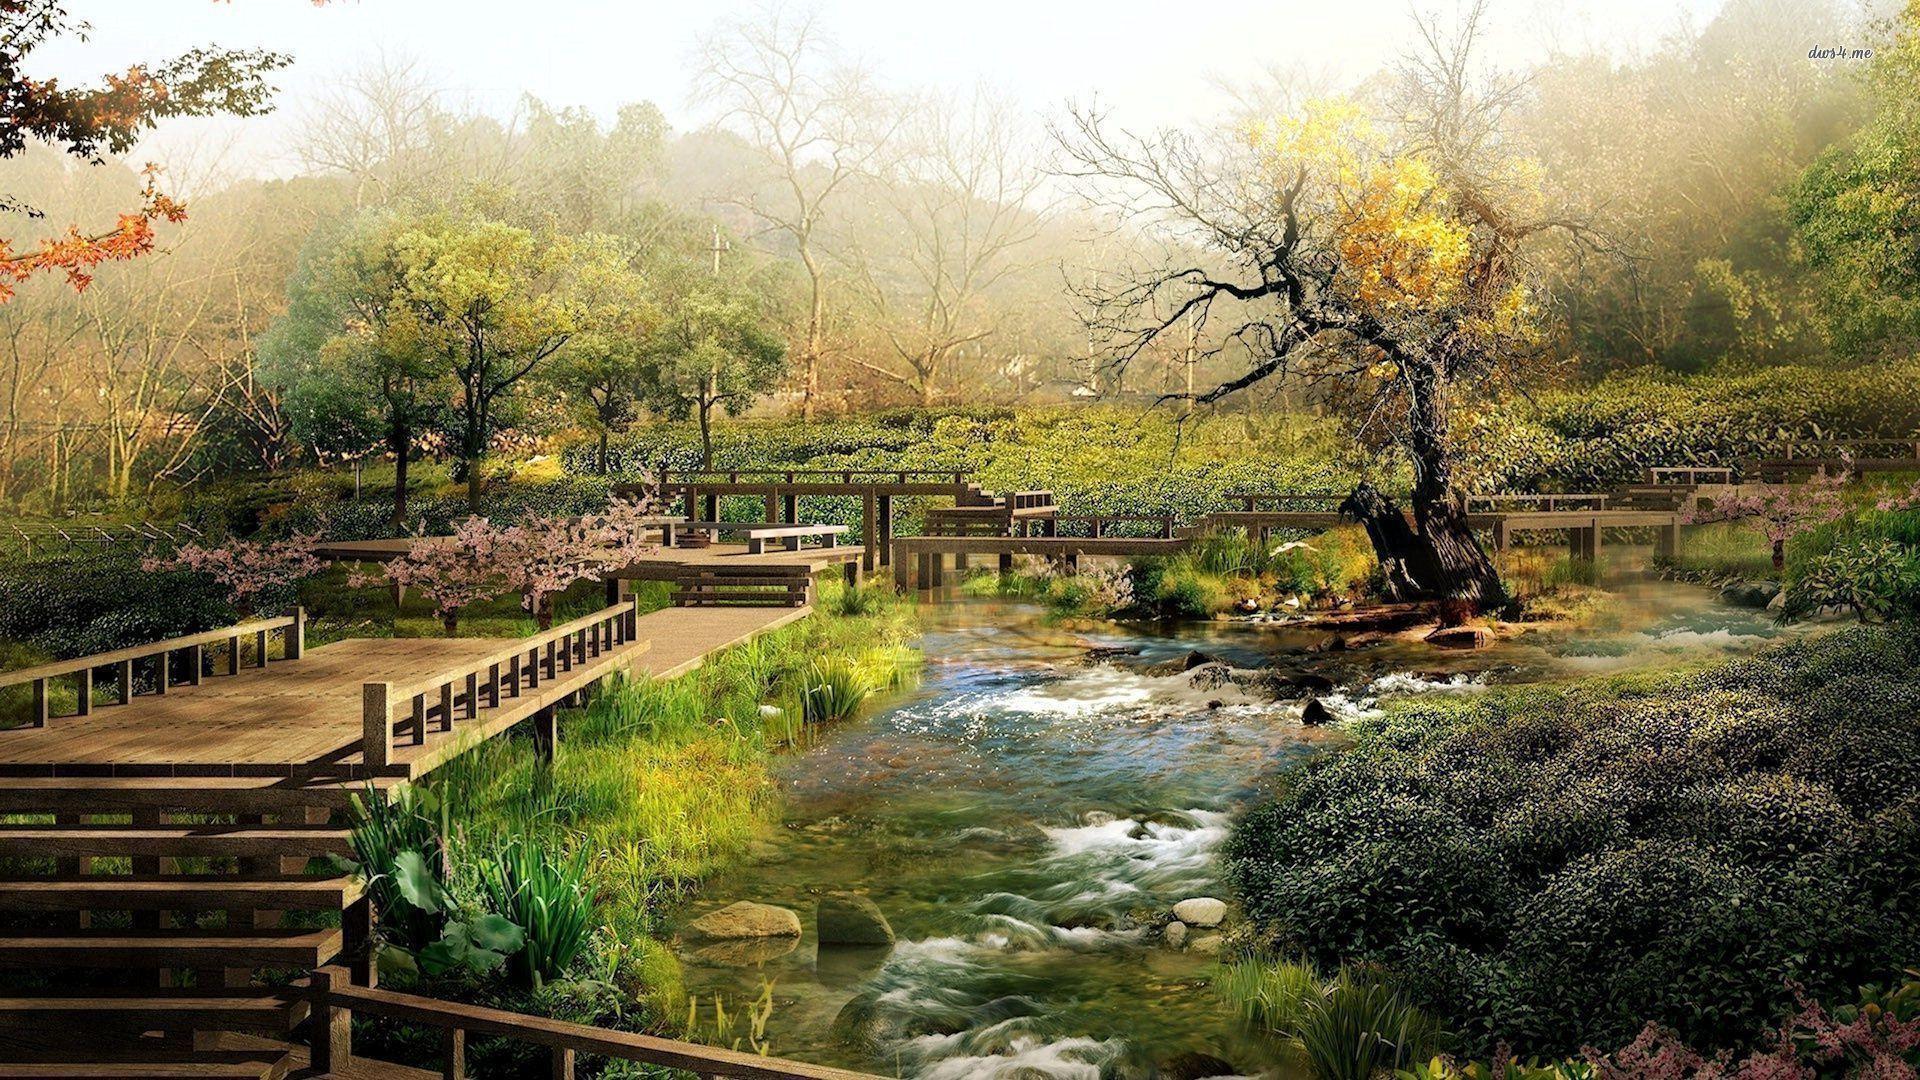 Japanese Garden wallpaper – Nature wallpapers – #